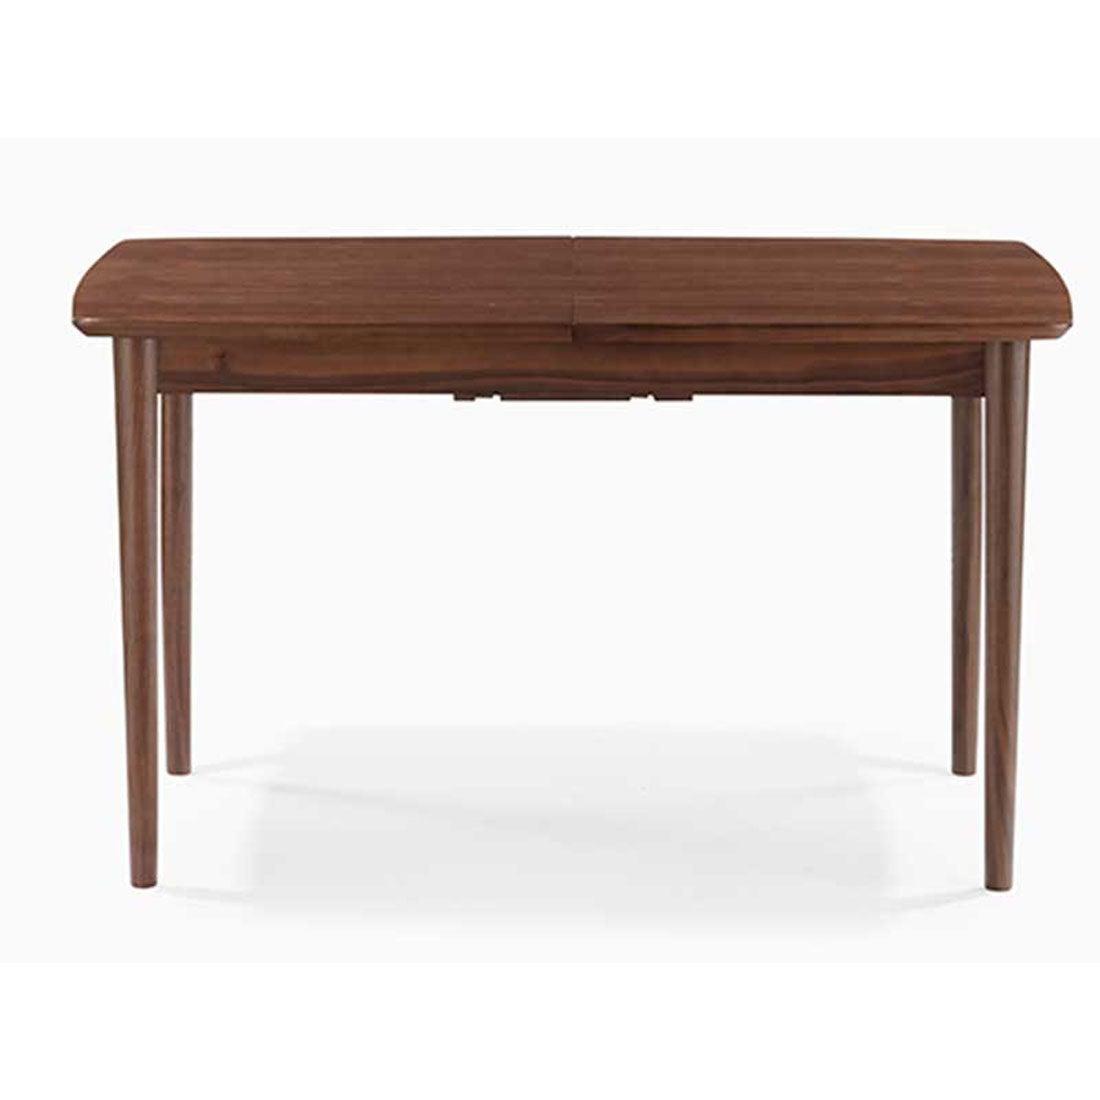 IDC OTSUKA/大塚家具 ダイニングテーブル(伸長式) ウイング WN 1500タイプ (ウォールナット)【返品不可商品】